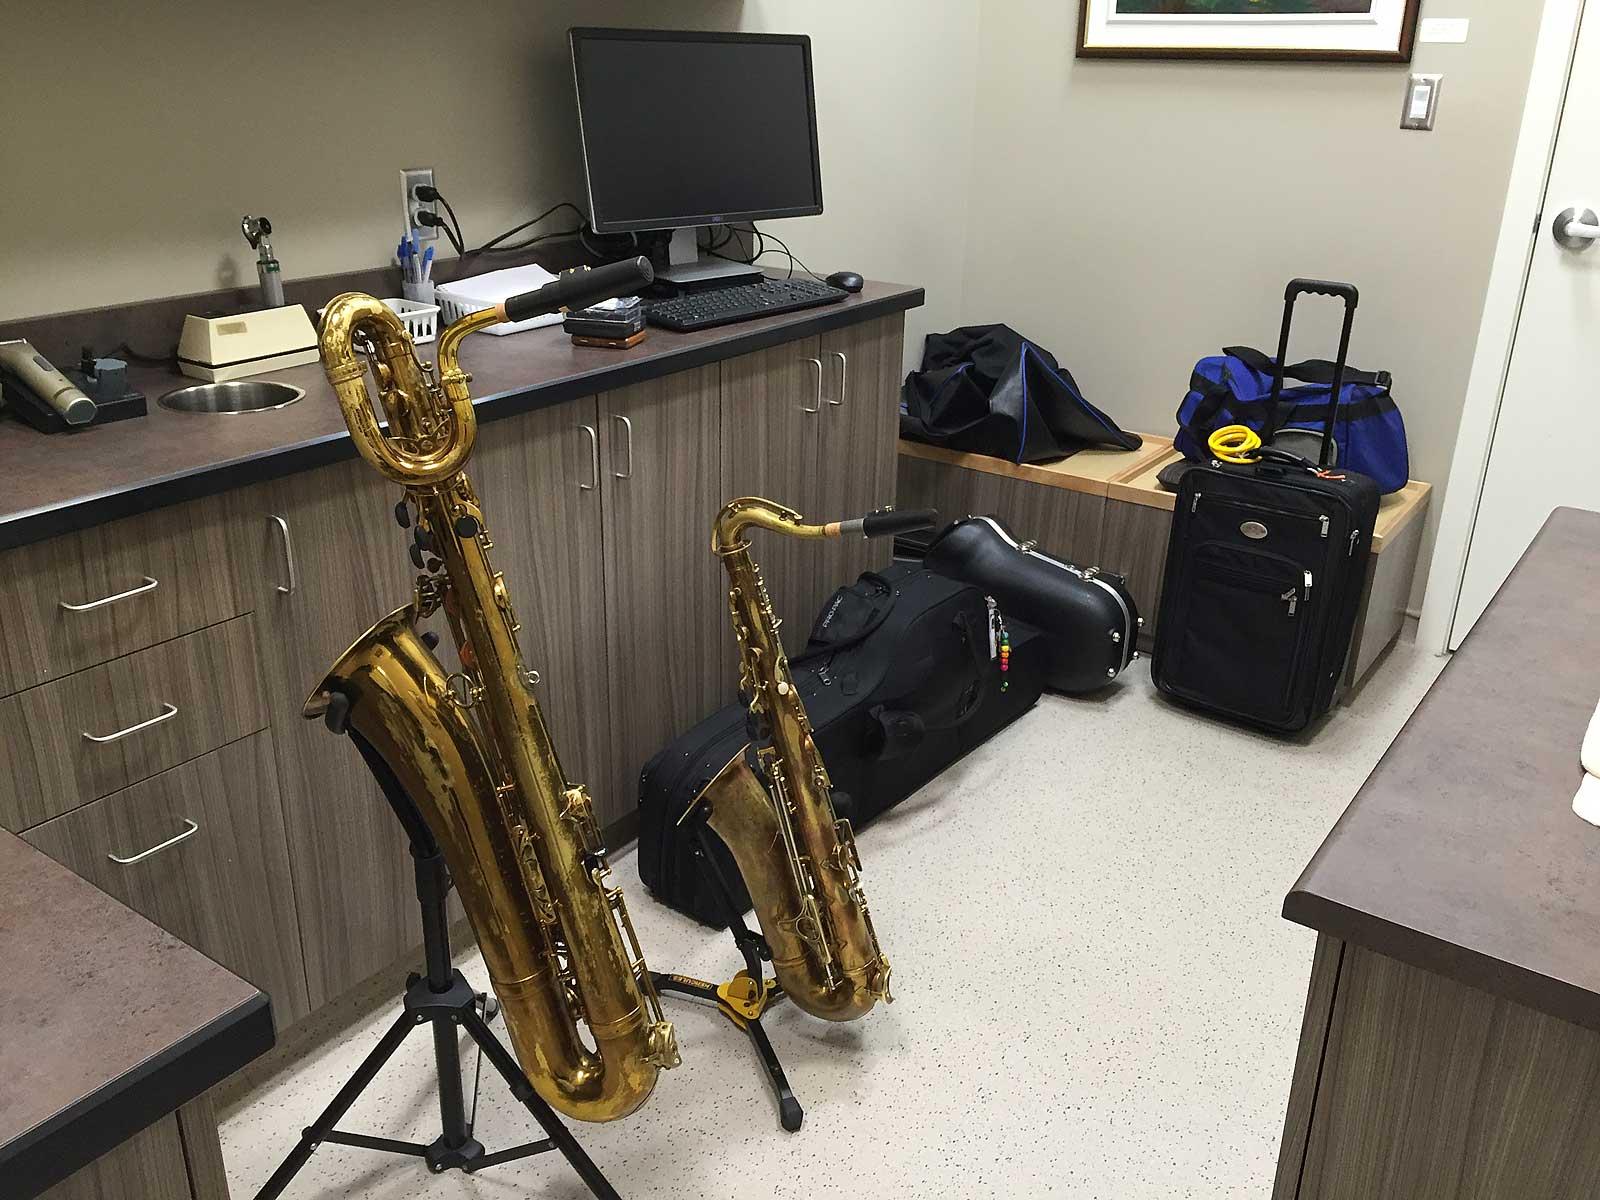 Mark VI bari sax, King Zephyr tenor sax, gig gear, green room, vet hospital exam room